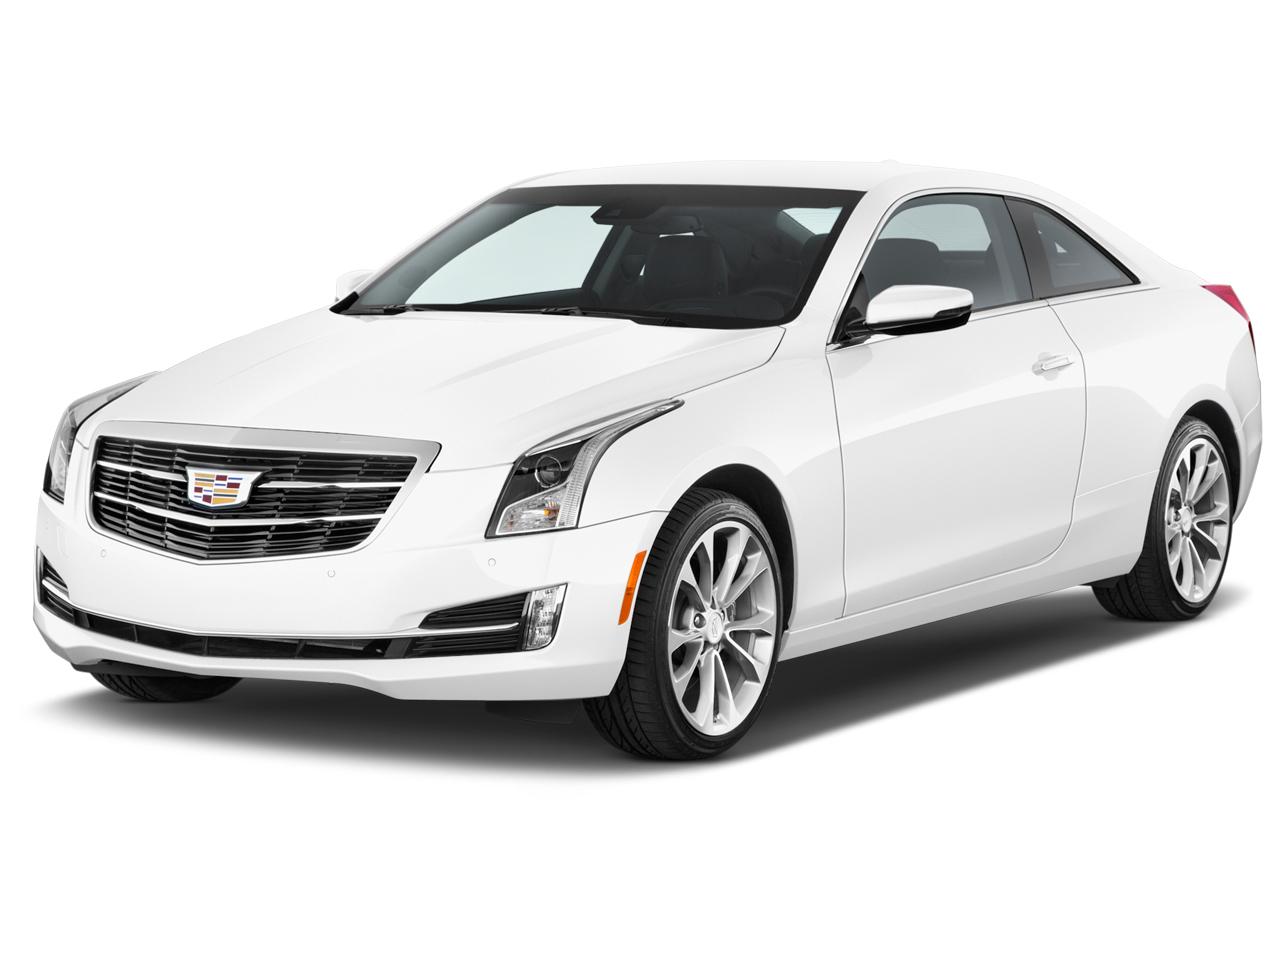 Cadillac ATS Coupe 2019 3.6L Premium Luxury, Saudi Arabia